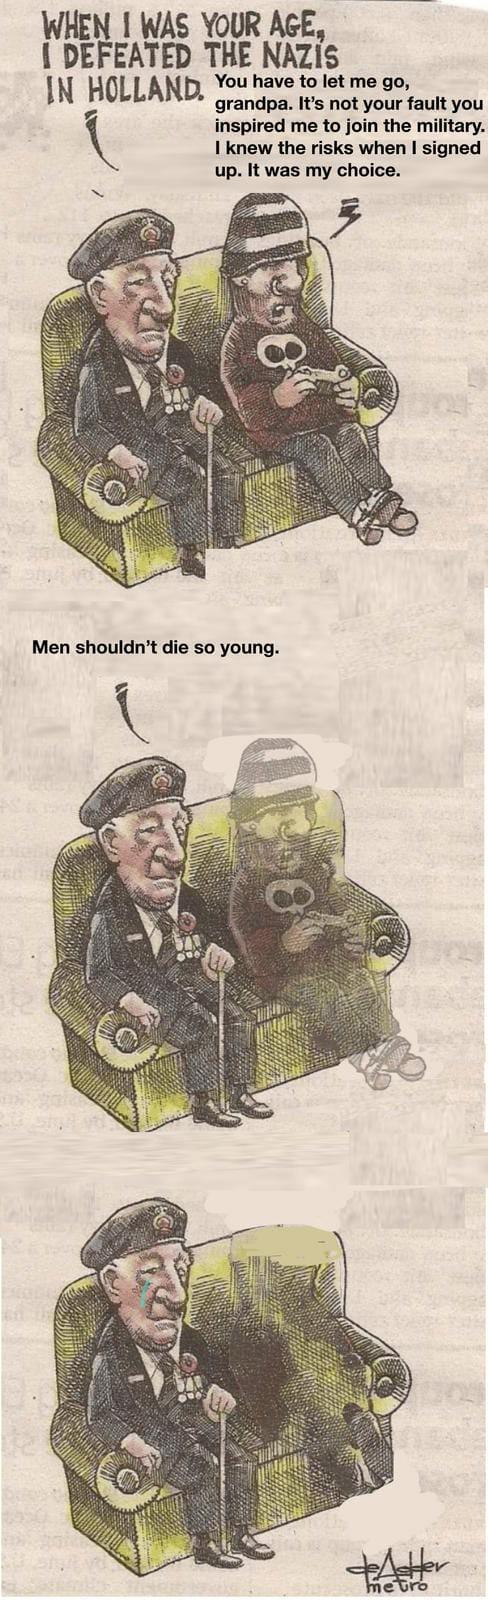 Sad meme war time